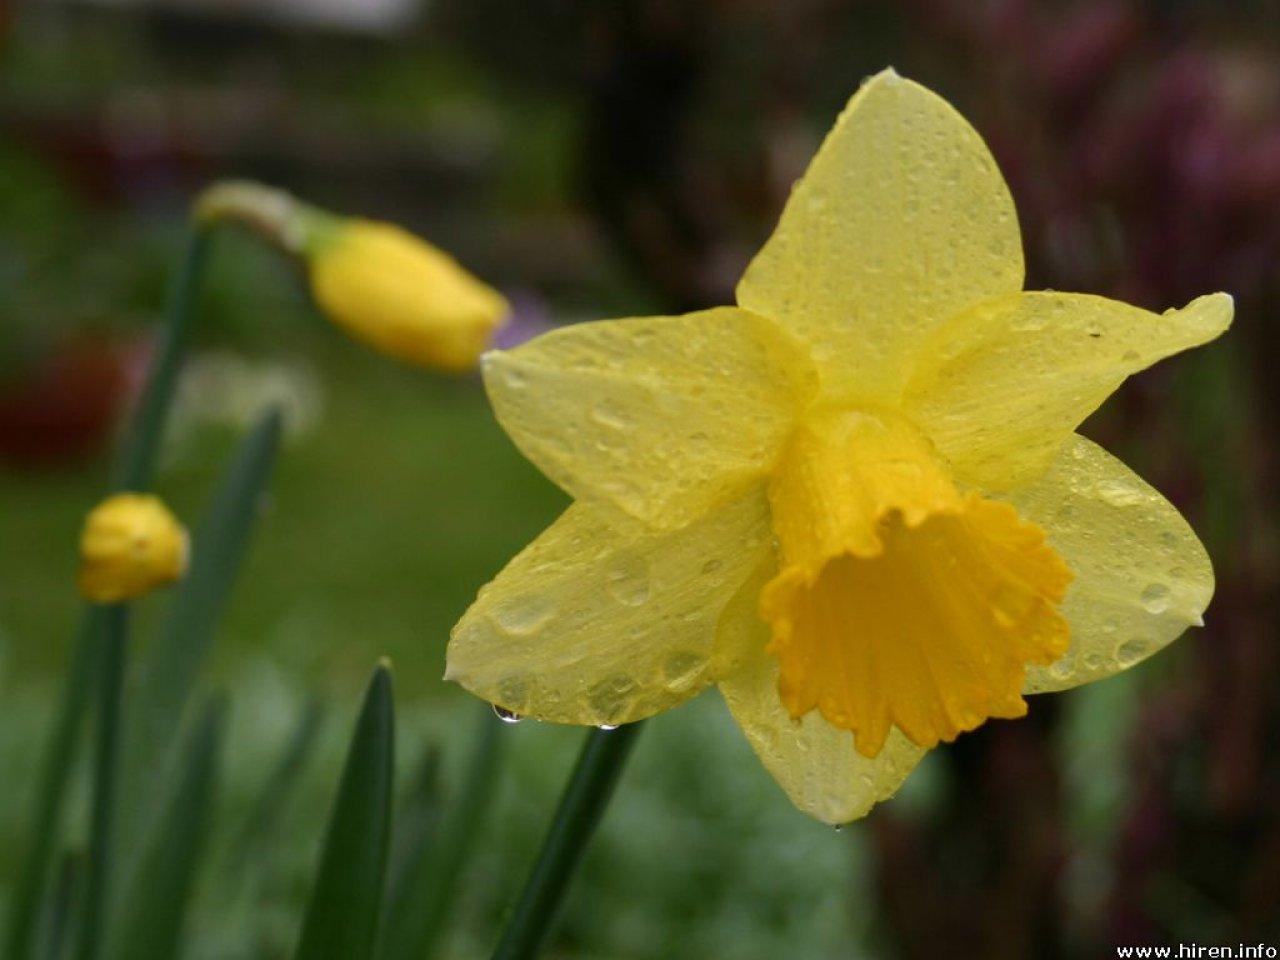 download daffodils 1920x1080 wallpaper - photo #17